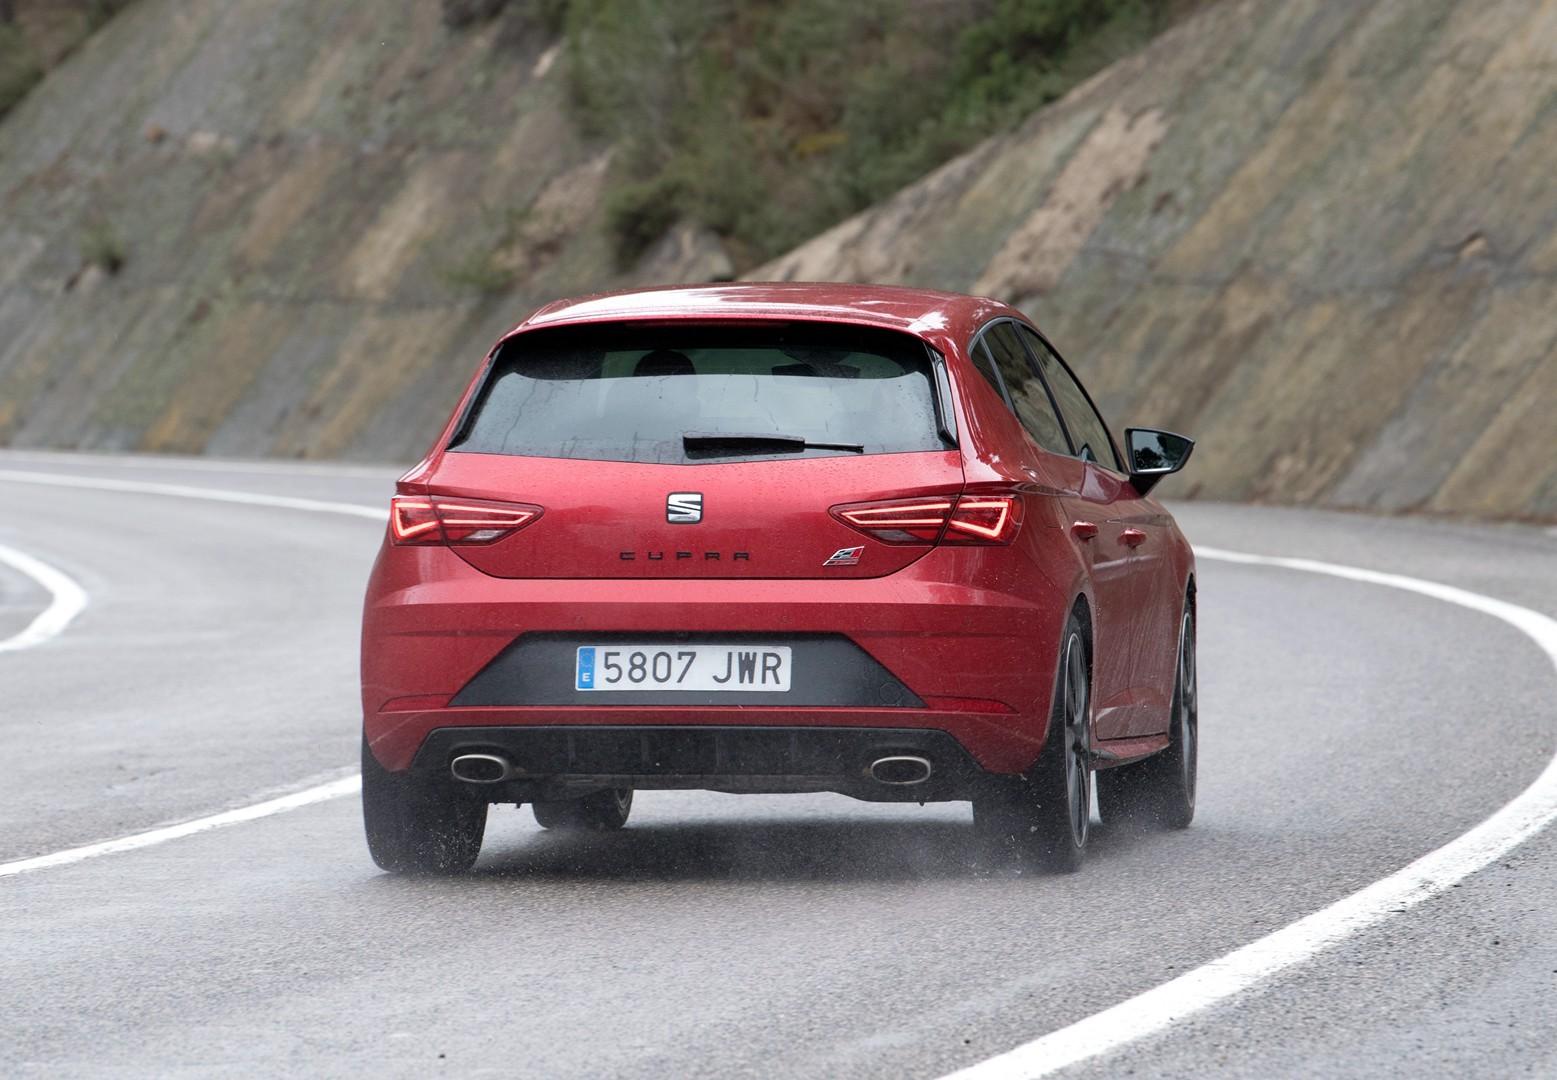 All-New SEAT Leon Coming by 2020, Electric Cupra Model Under Development - autoevolution